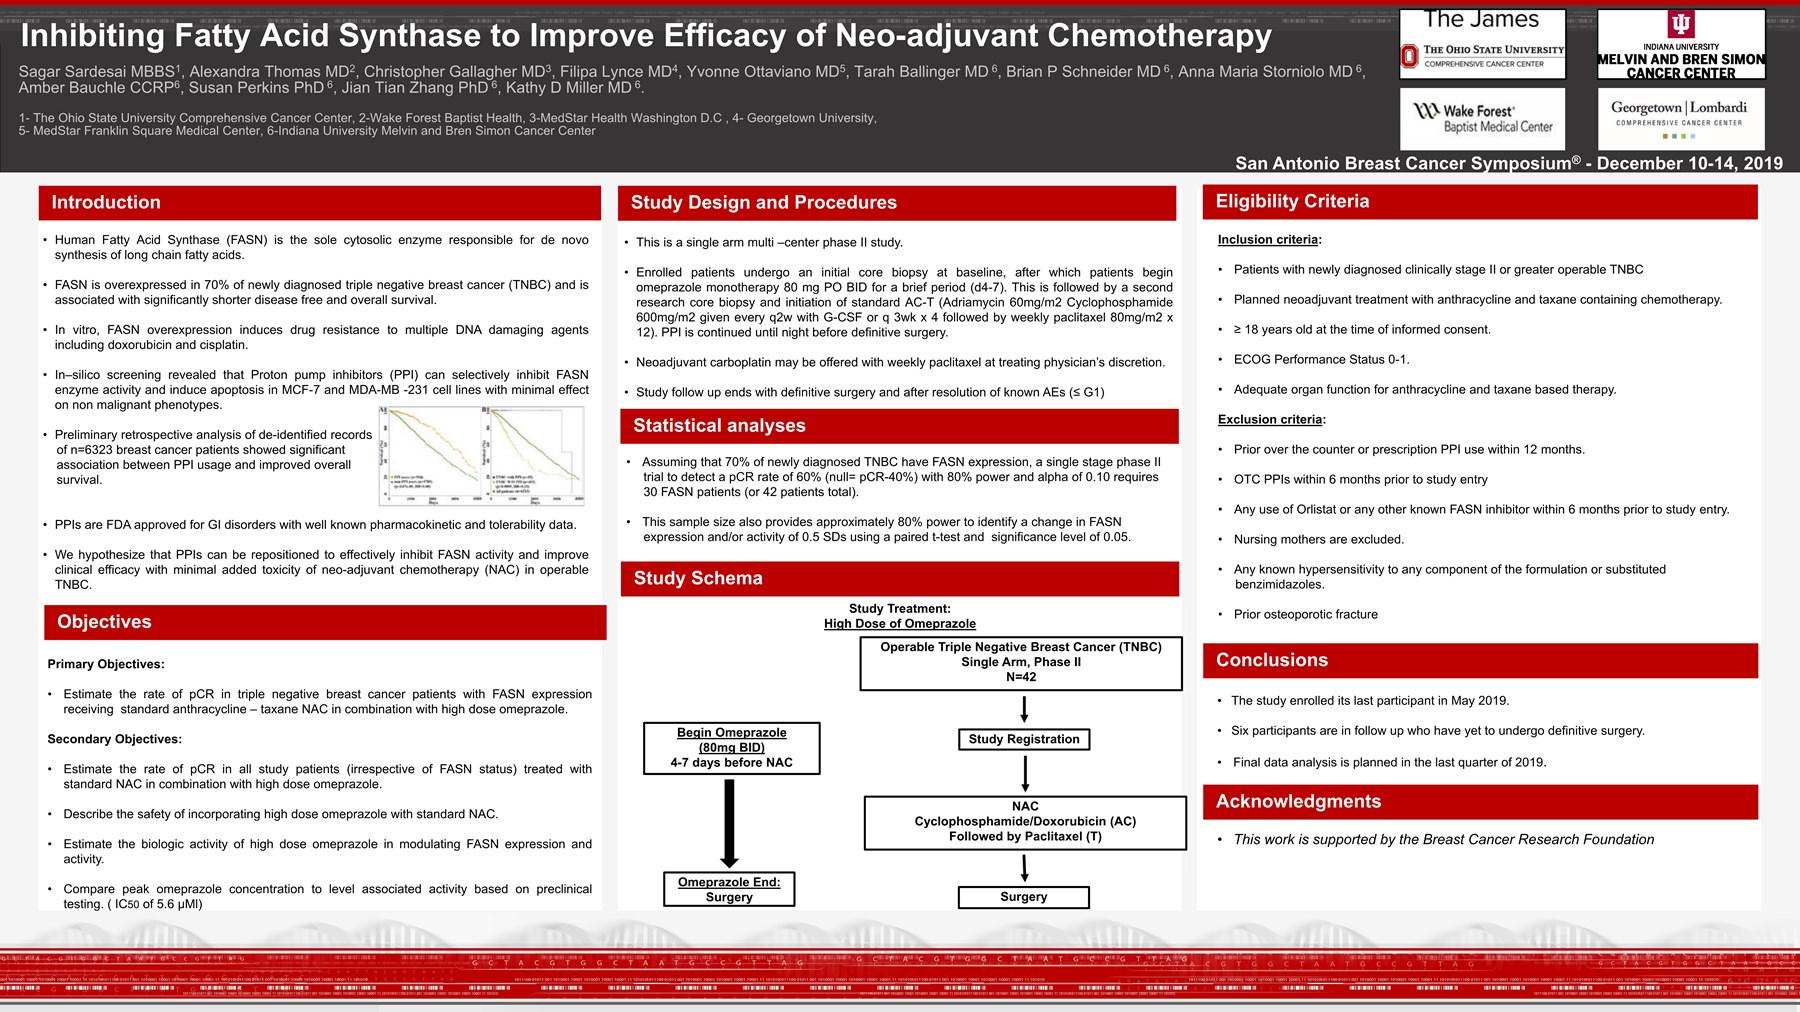 Inhibiting fatty acid synthase to improve efficacy of neoadjuvant chemotherapy